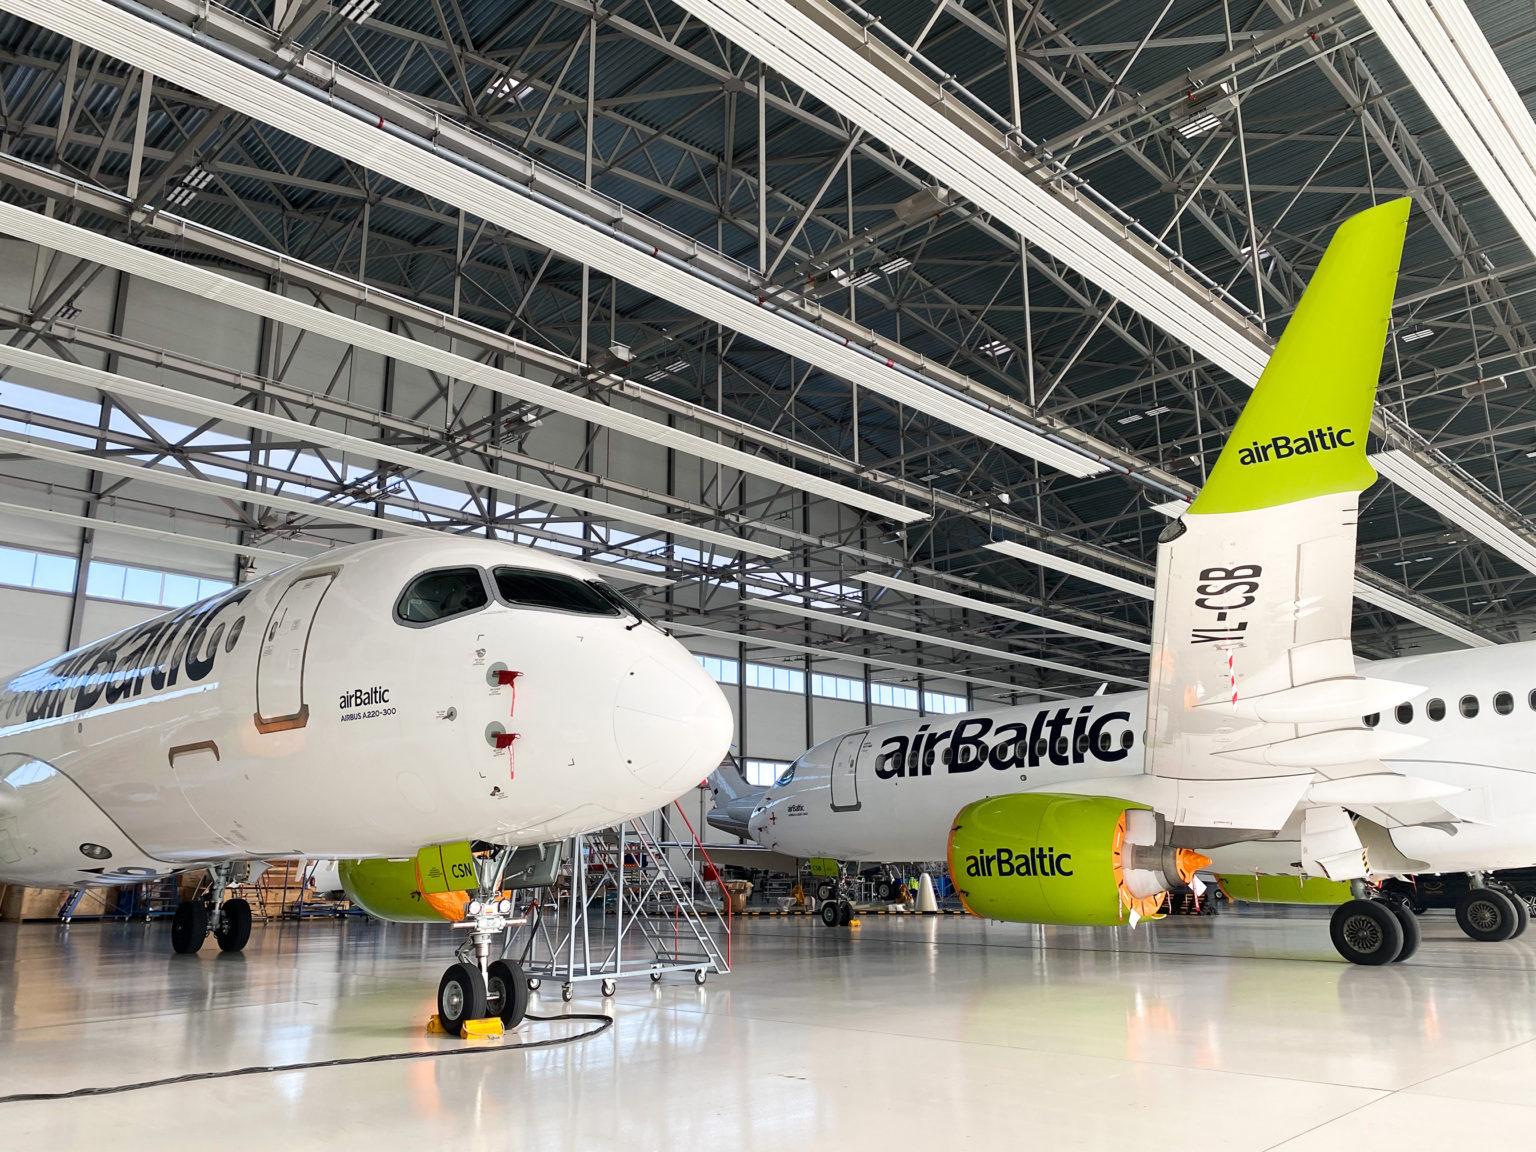 Foto: airBaltic